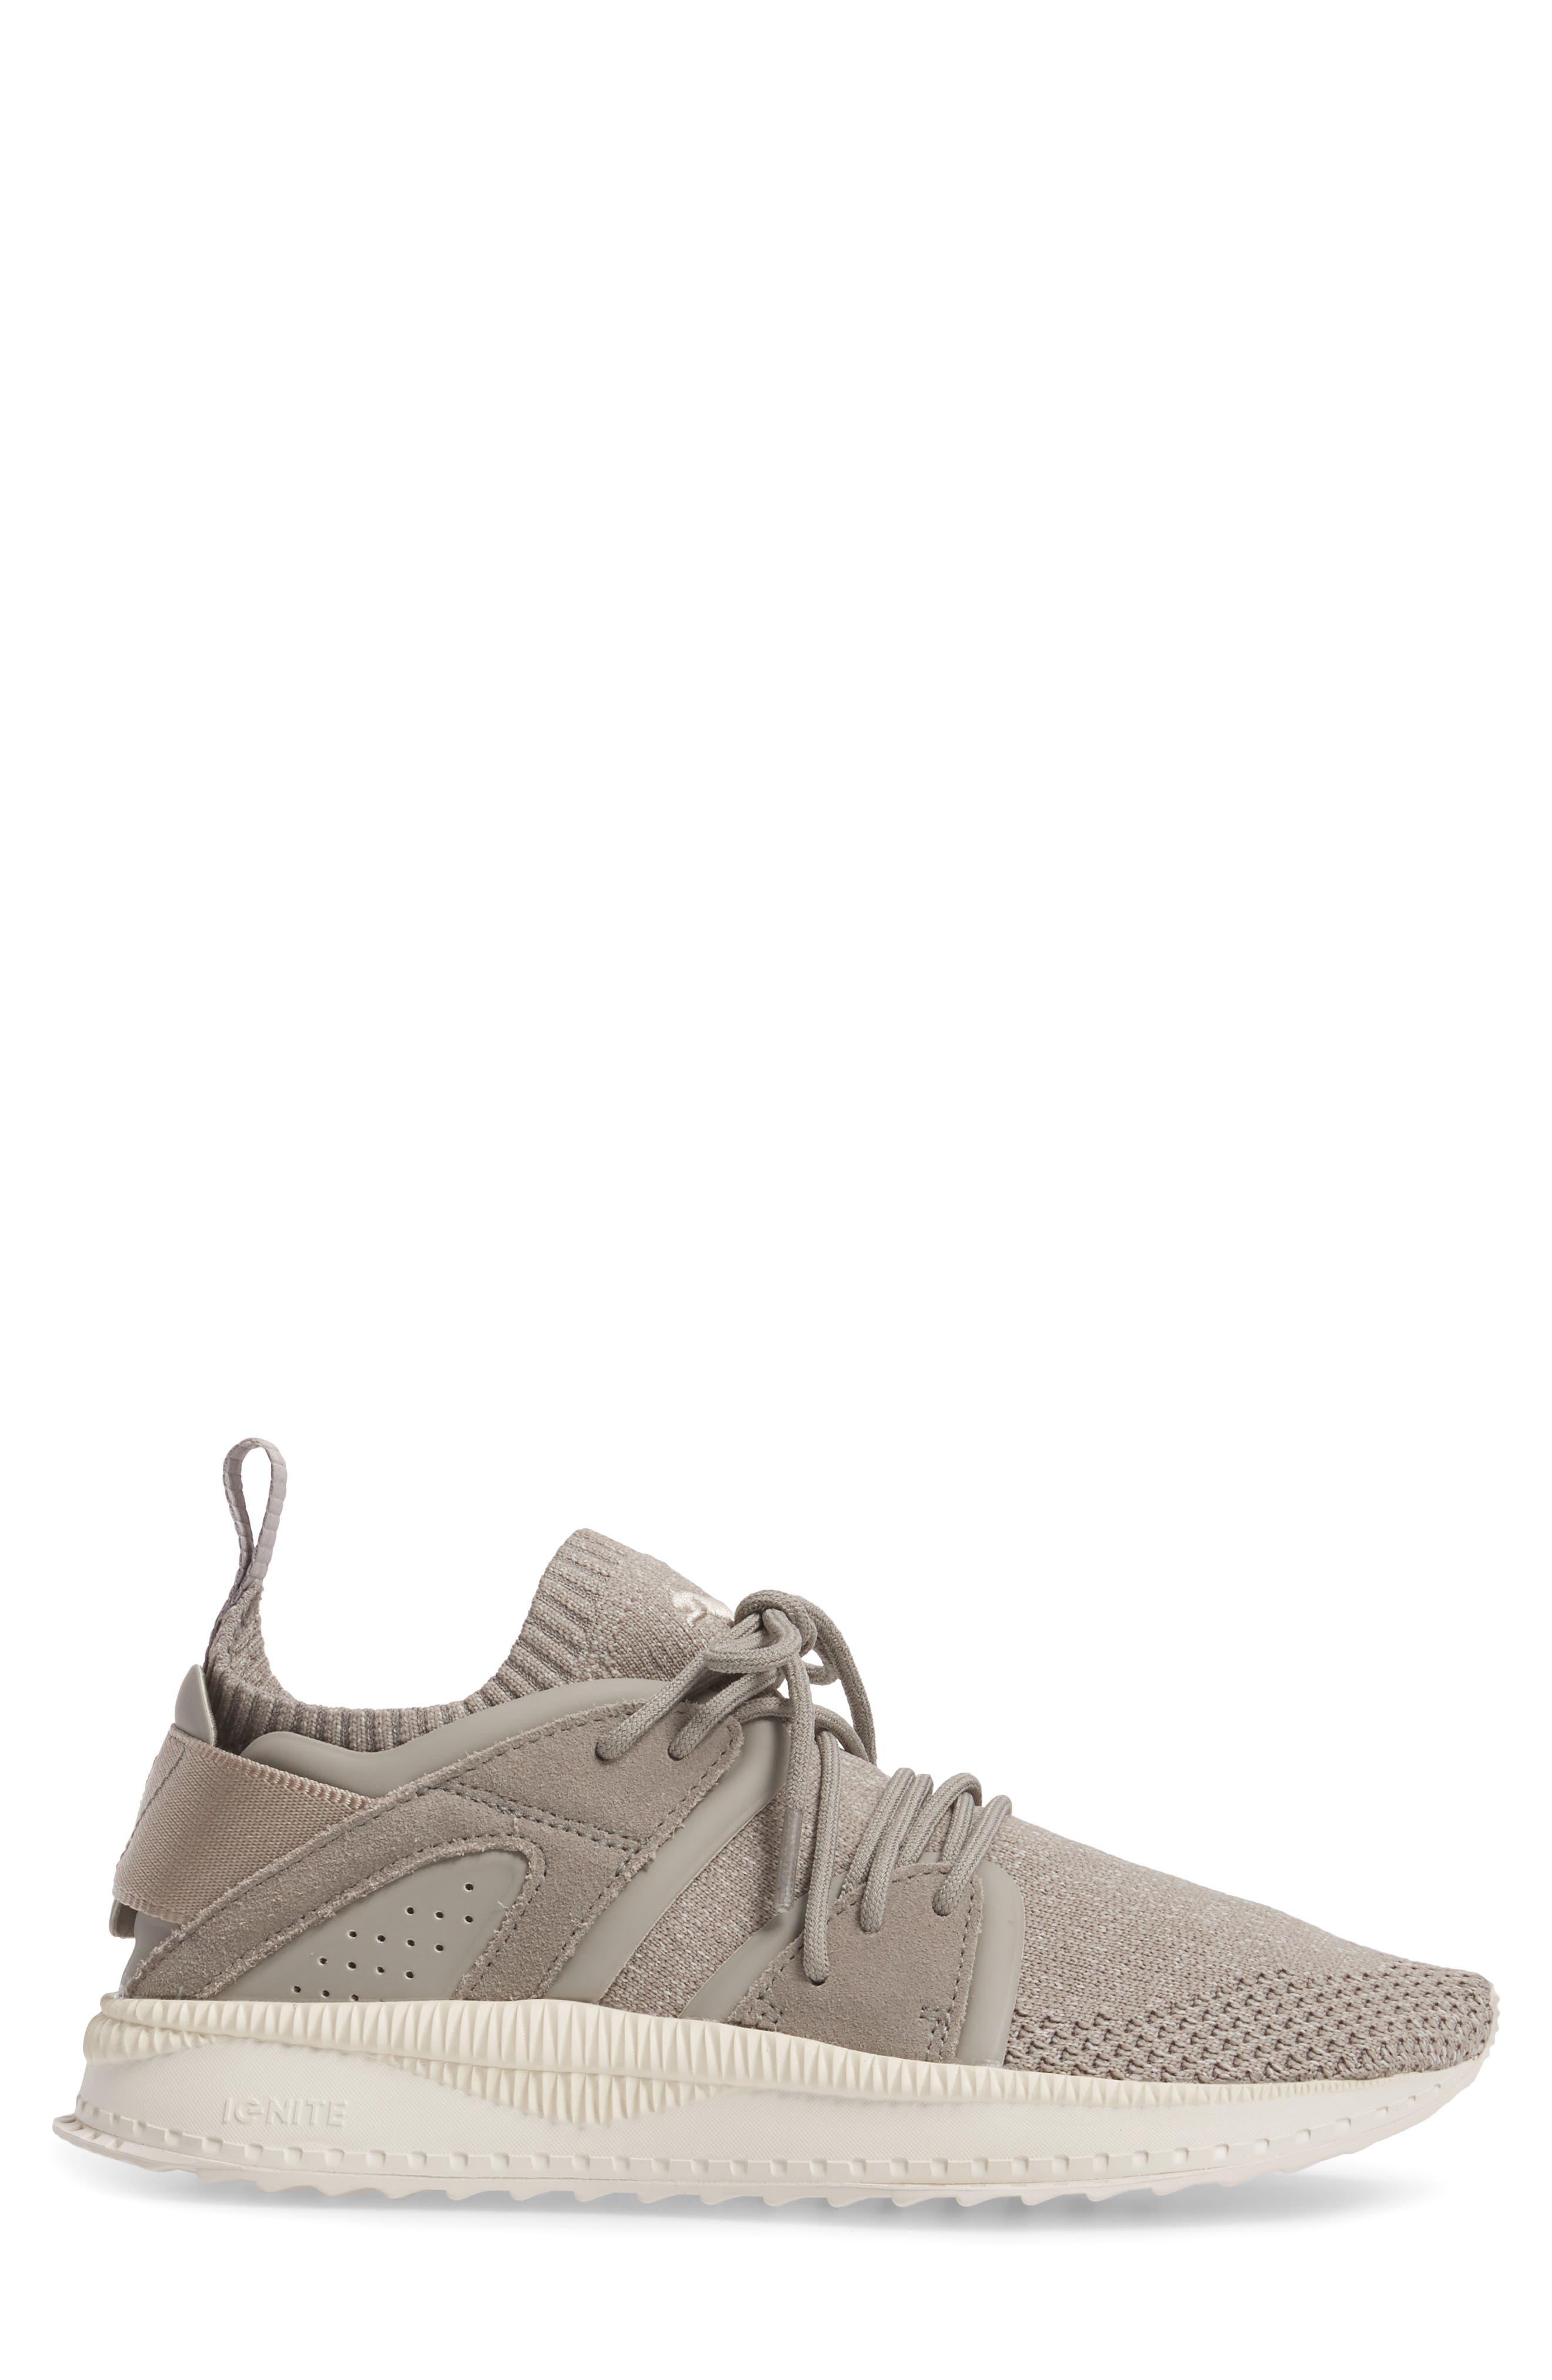 Tsug Blaze Evoknit Sneaker,                             Alternate thumbnail 3, color,                             253